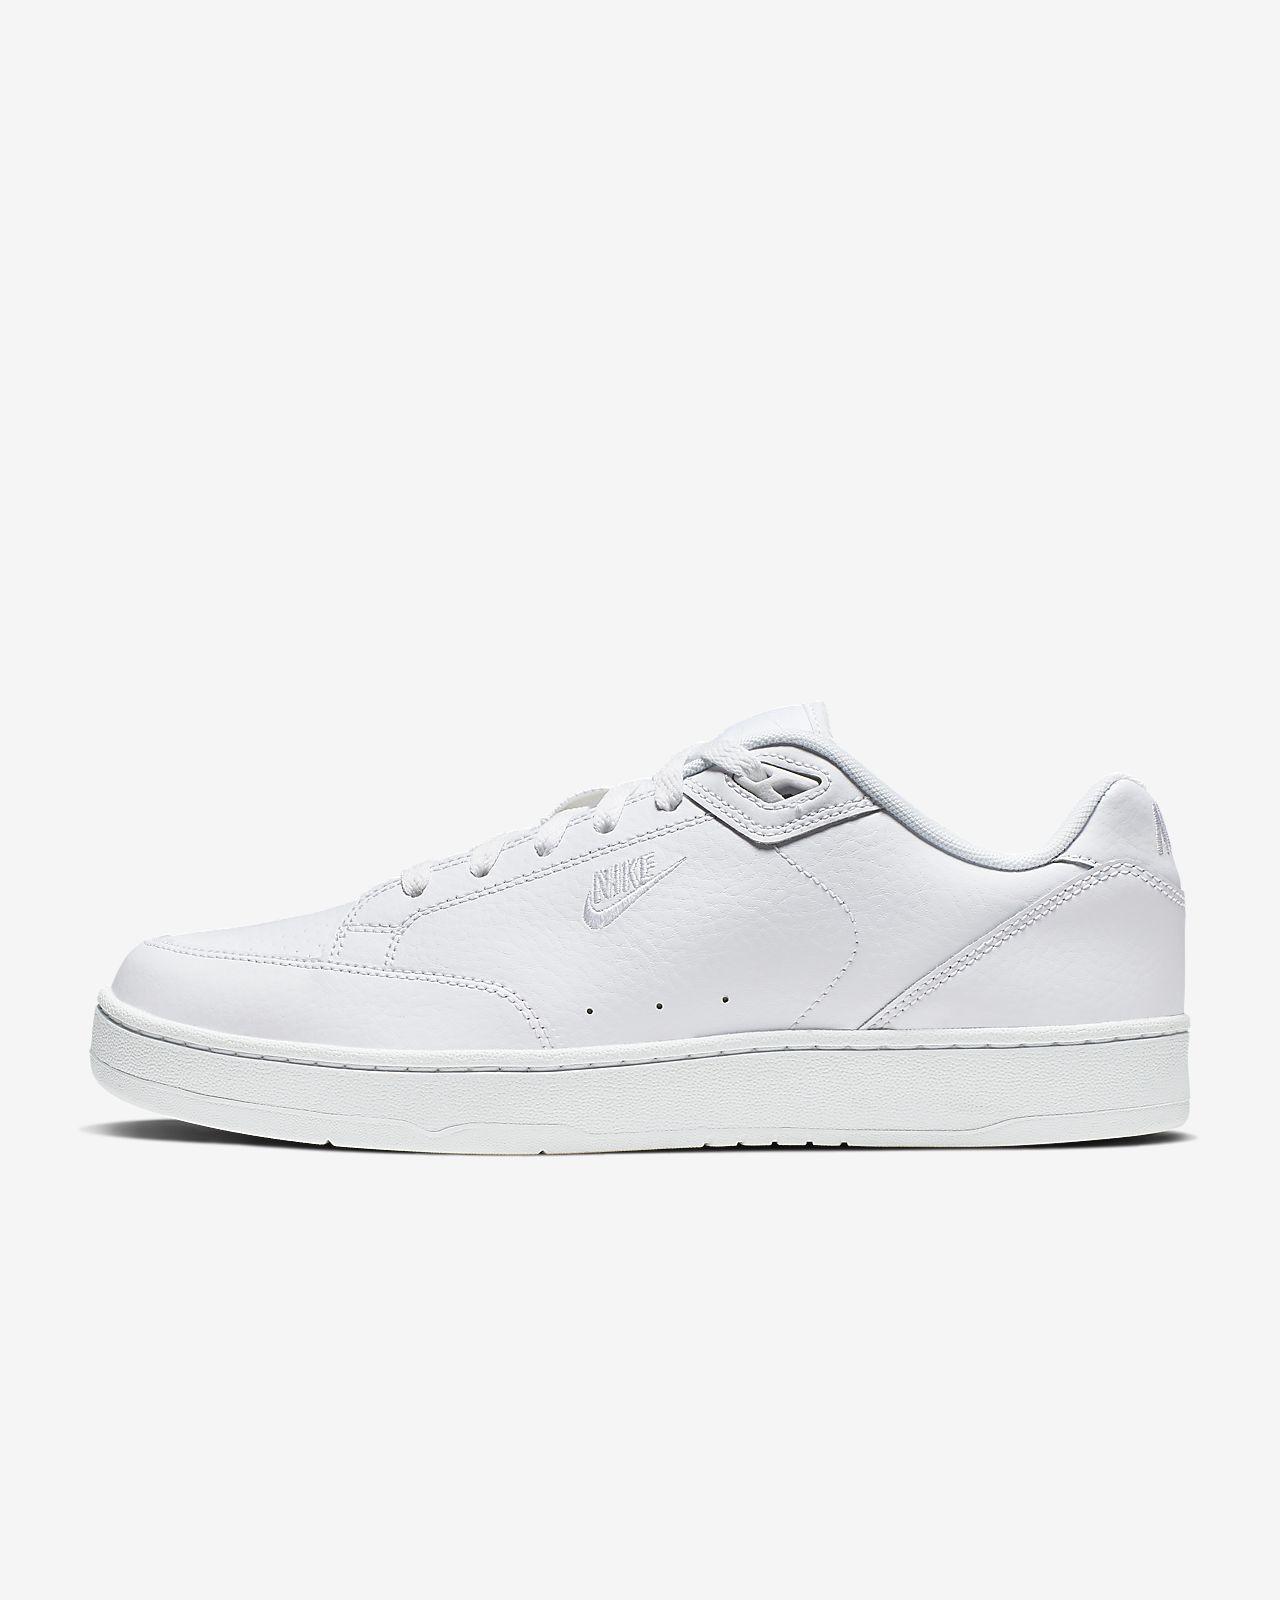 8dd271557c7 Nike Grandstand II Men's Shoe